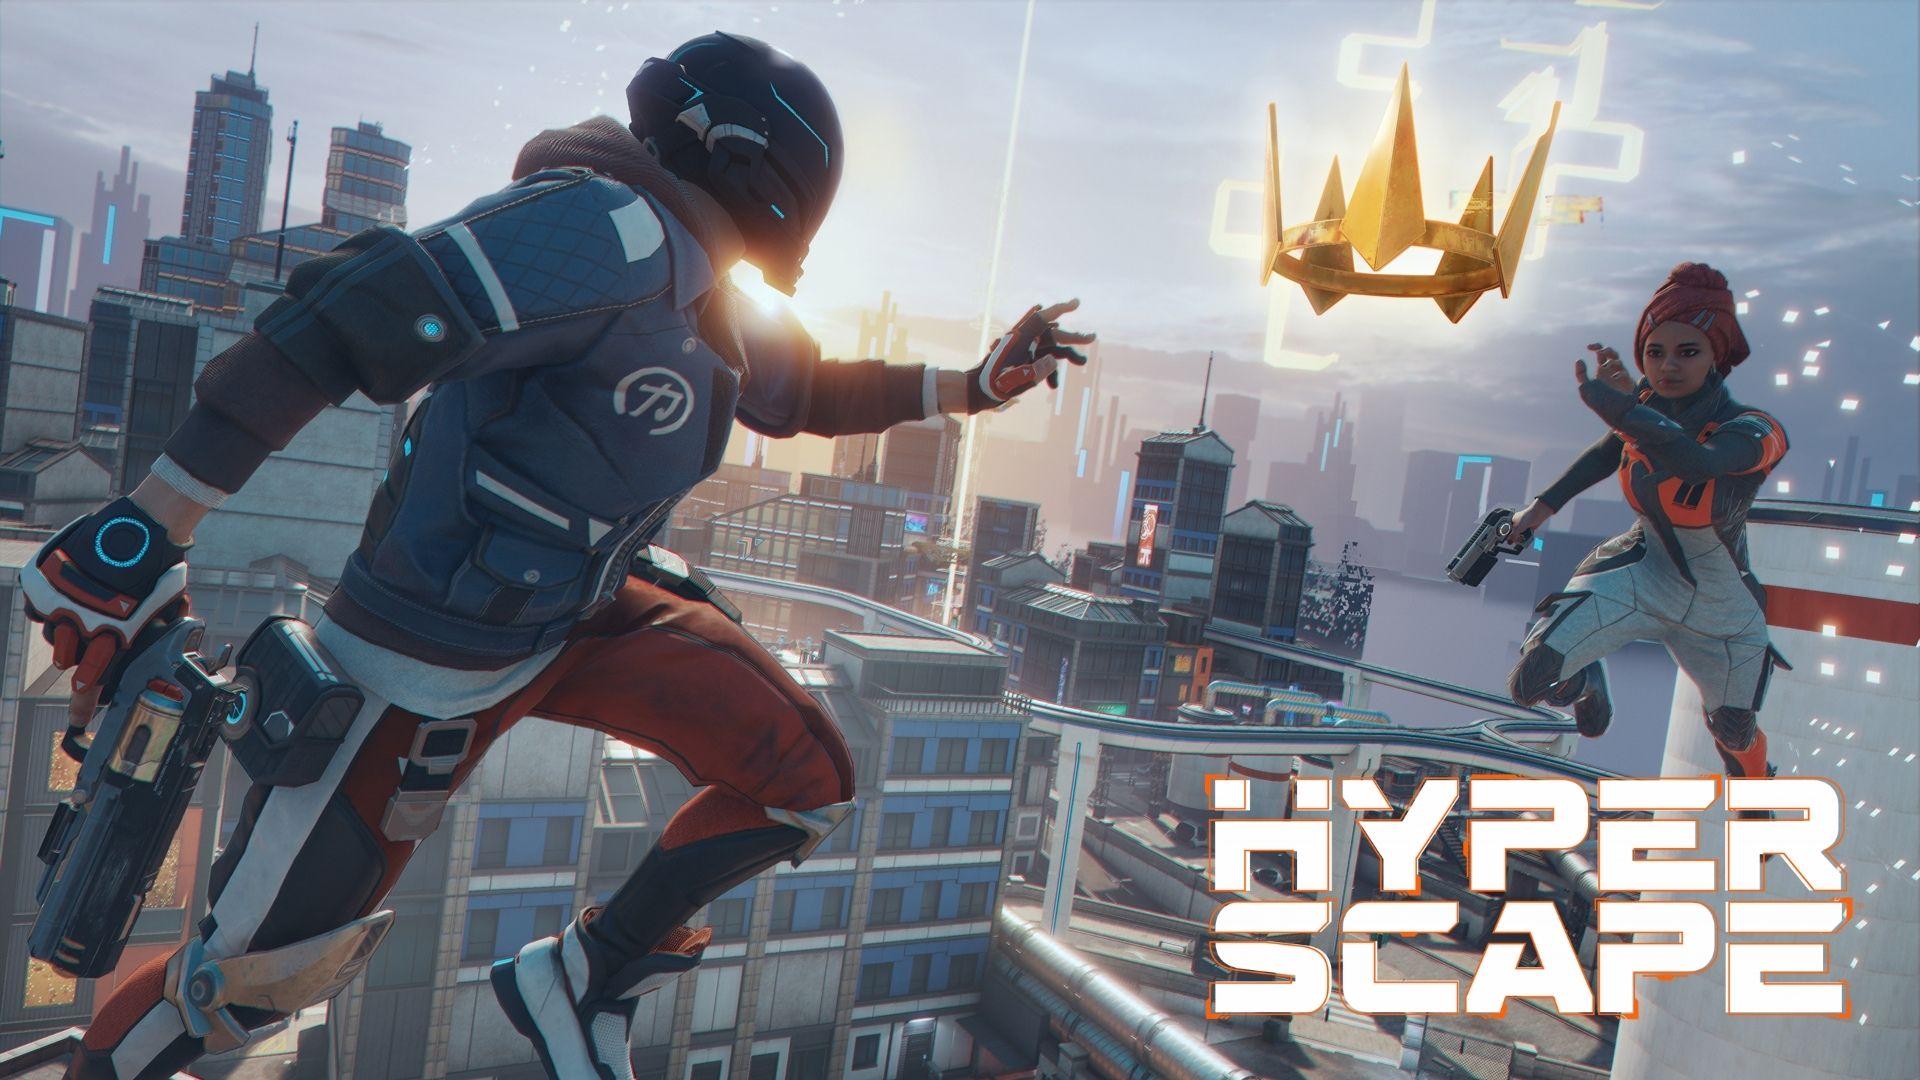 hyper scape patch 0.5